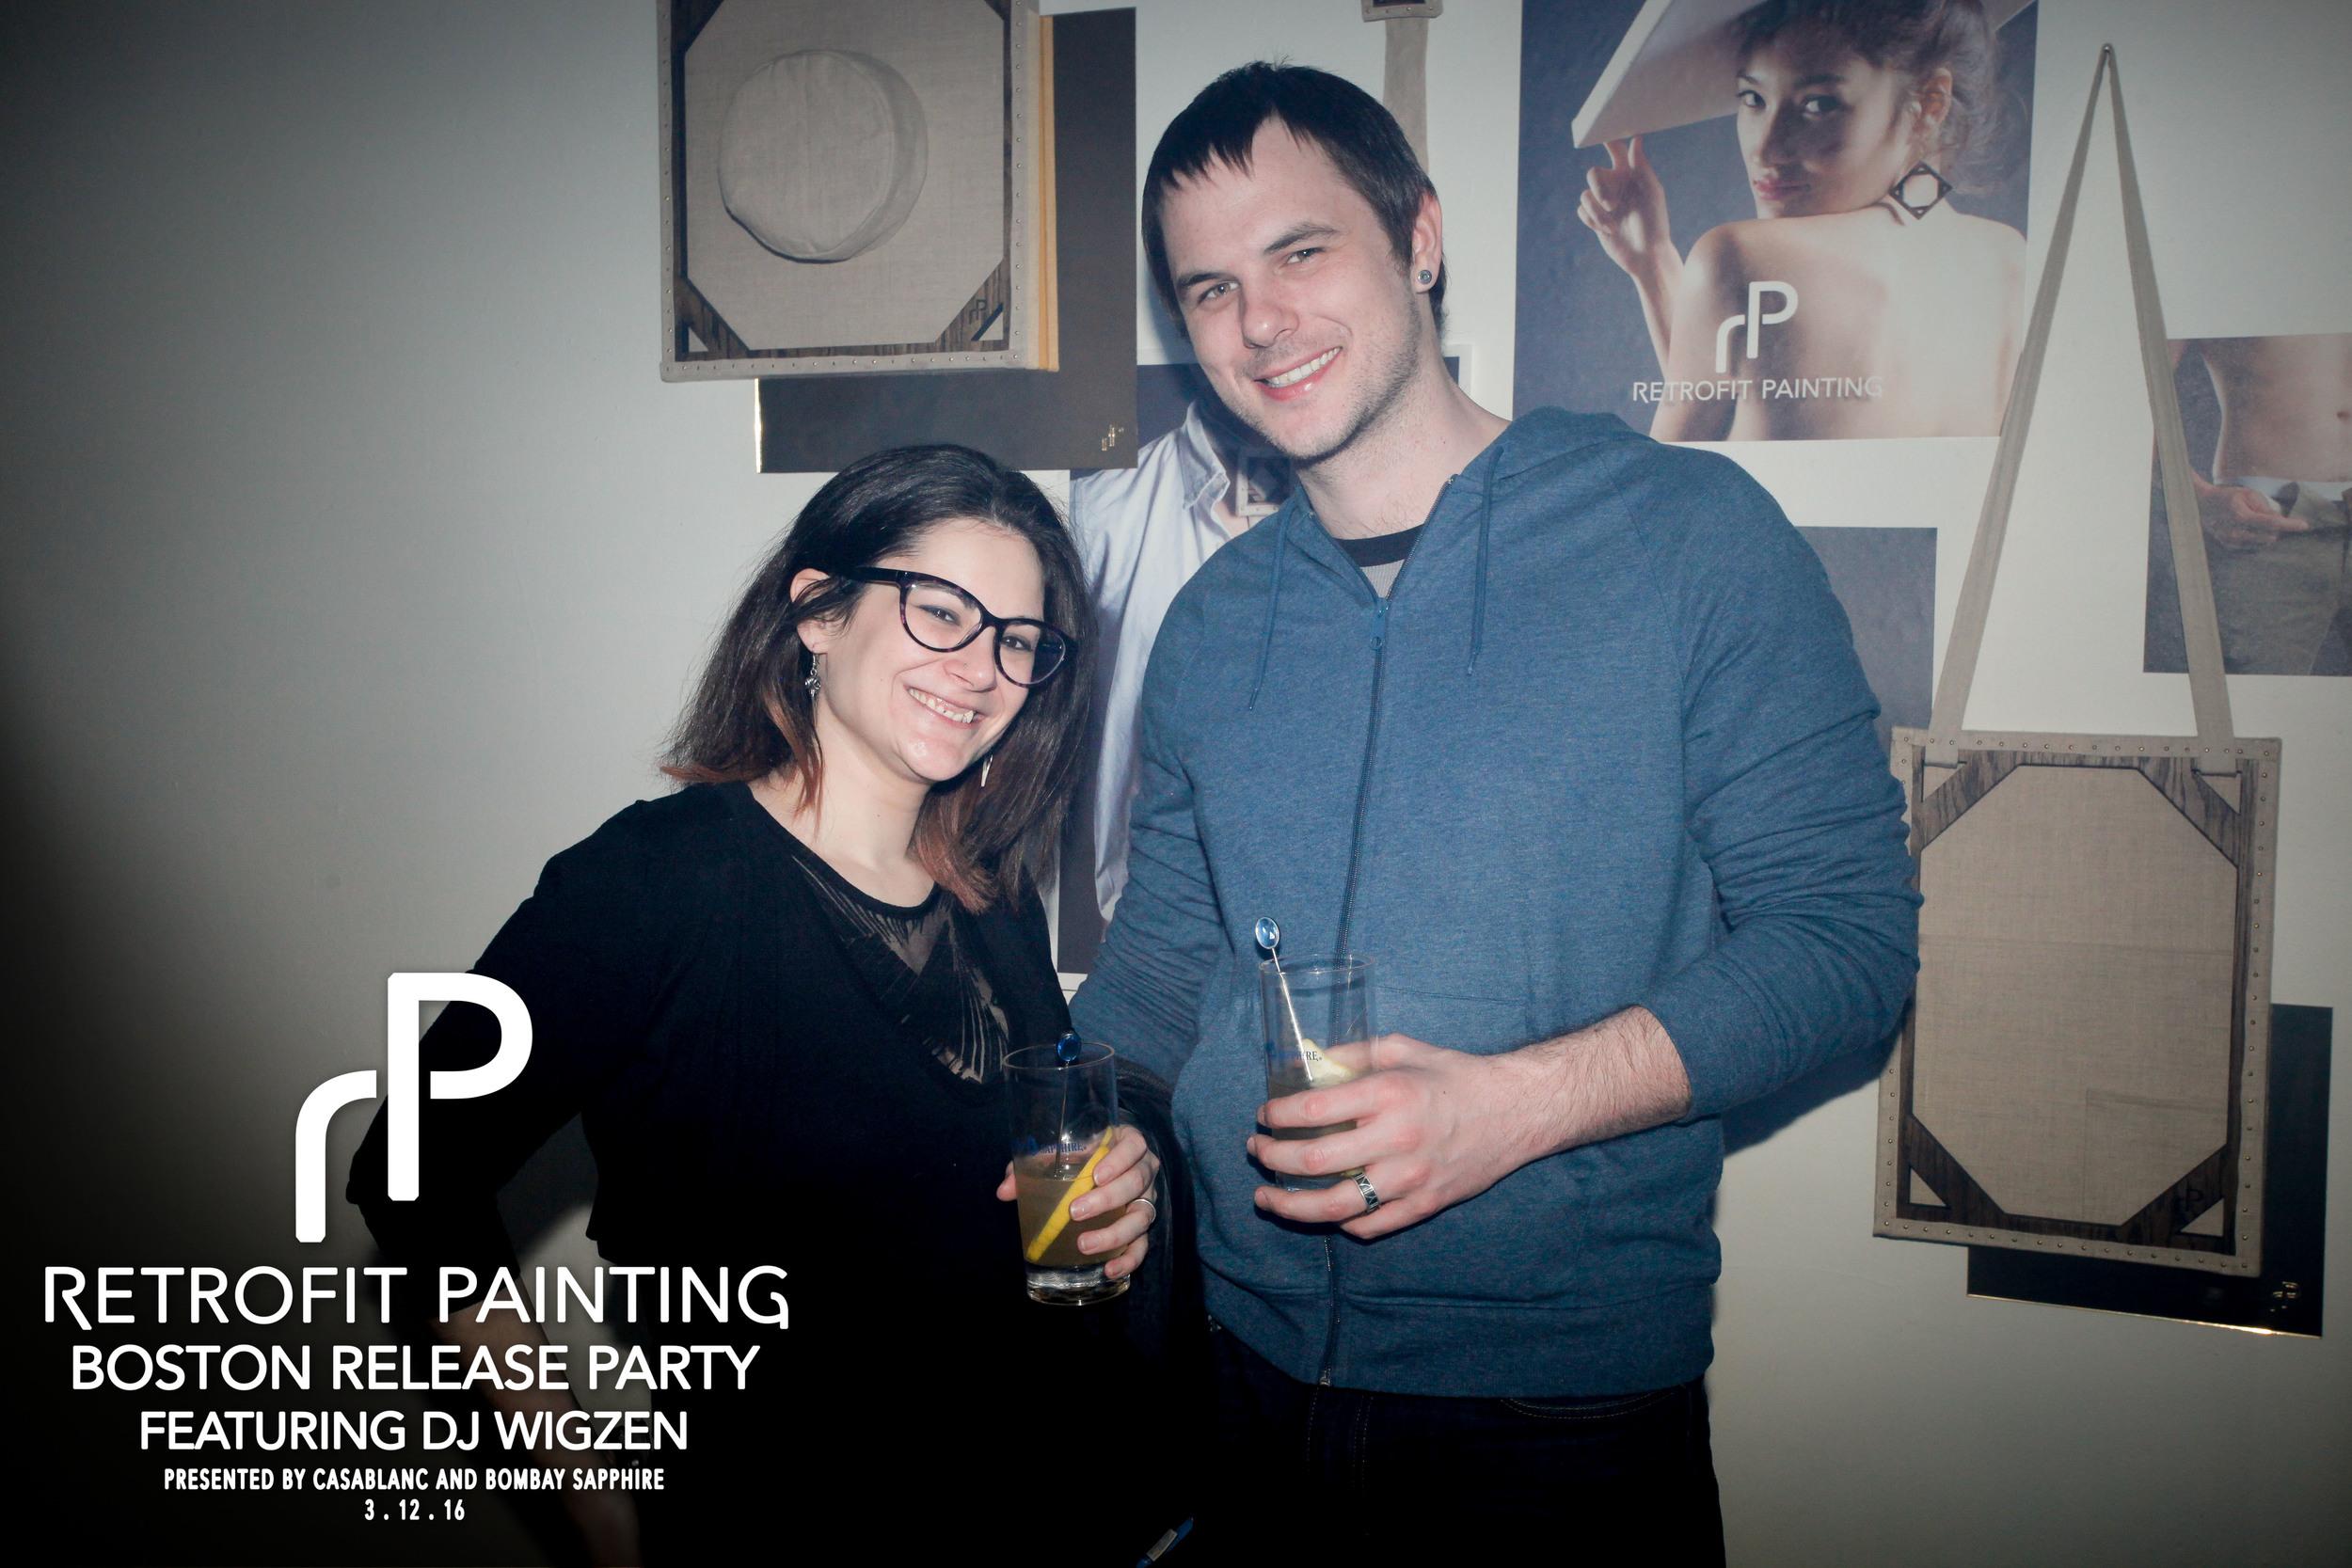 Retrofit Painting Boston Release Party 0018.jpg